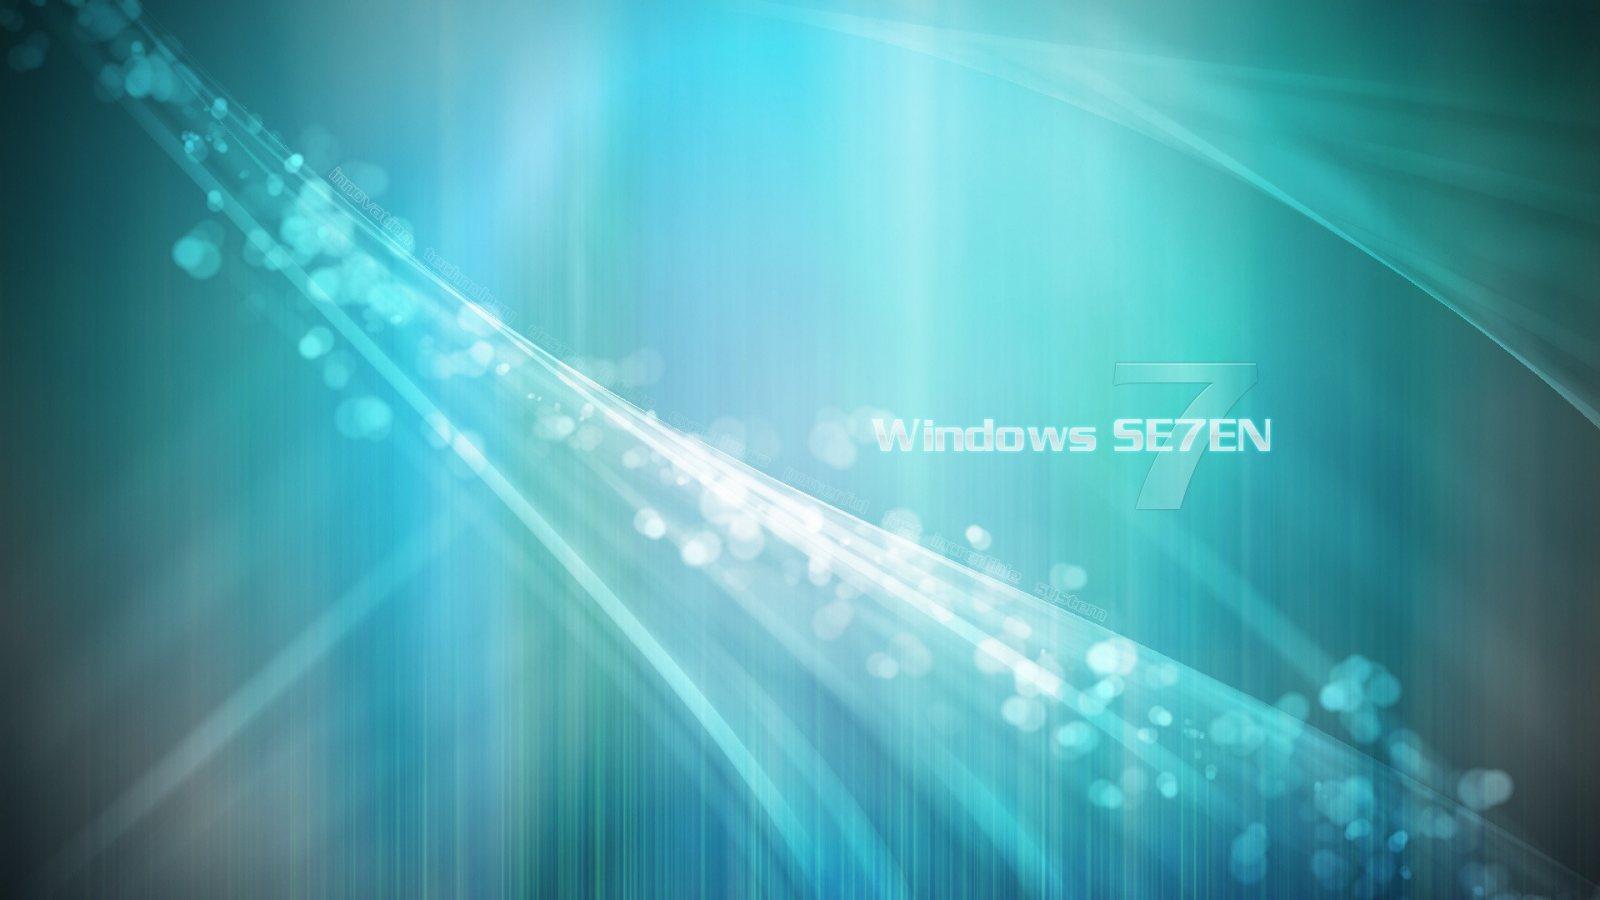 wallpaper windows se7en 1600x900 Wallpapers HD Widescreen Desktop 1600x900